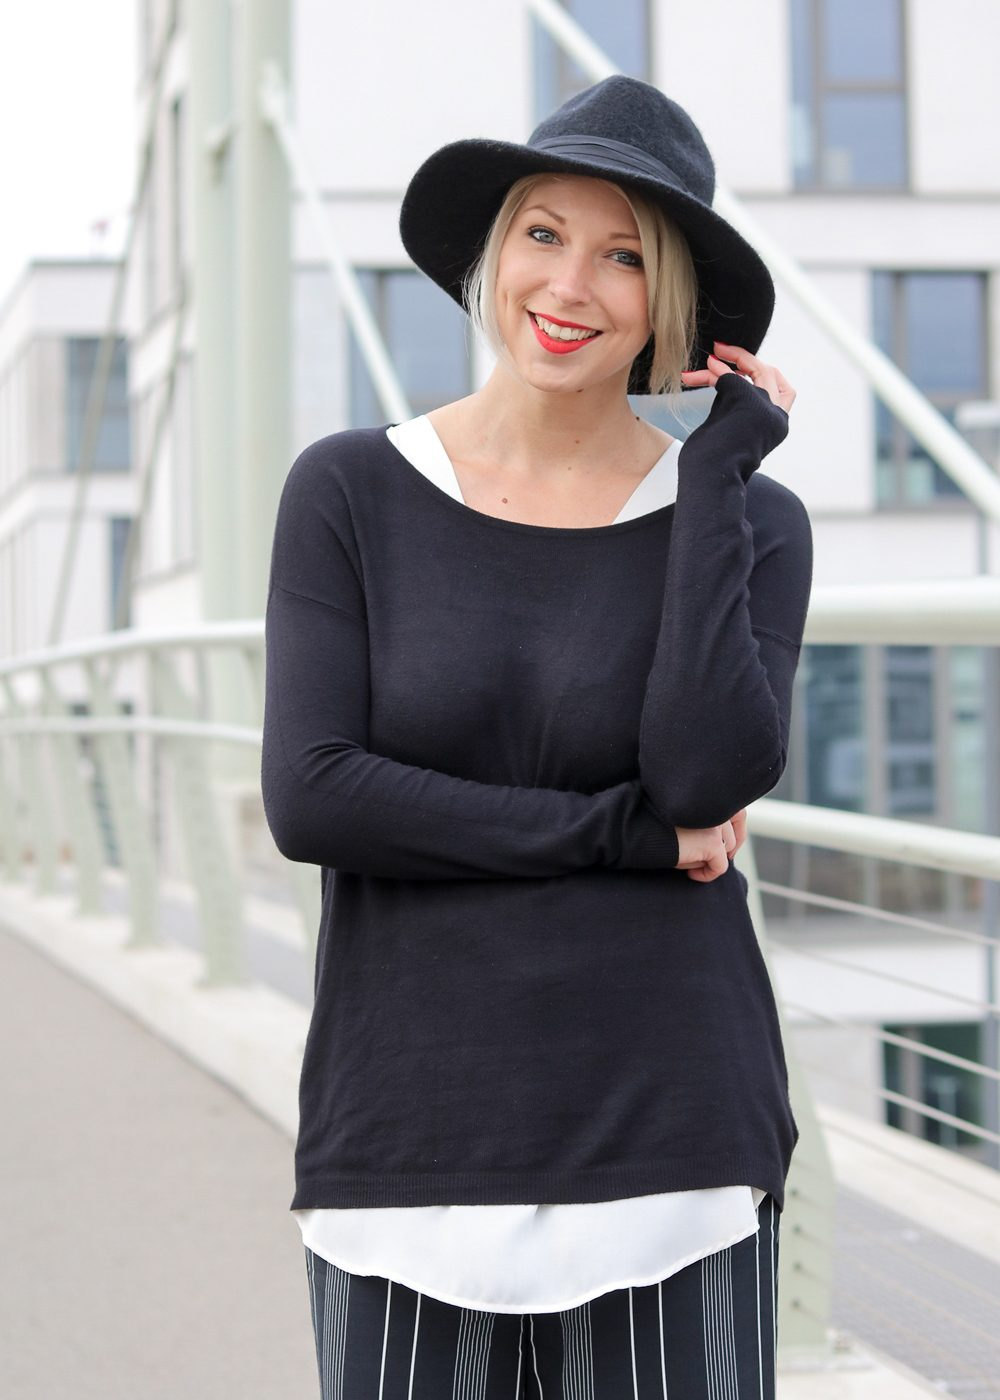 fashionblogger-outfit-palazzohose-streifen-mango-sweater-hut-7-von-17